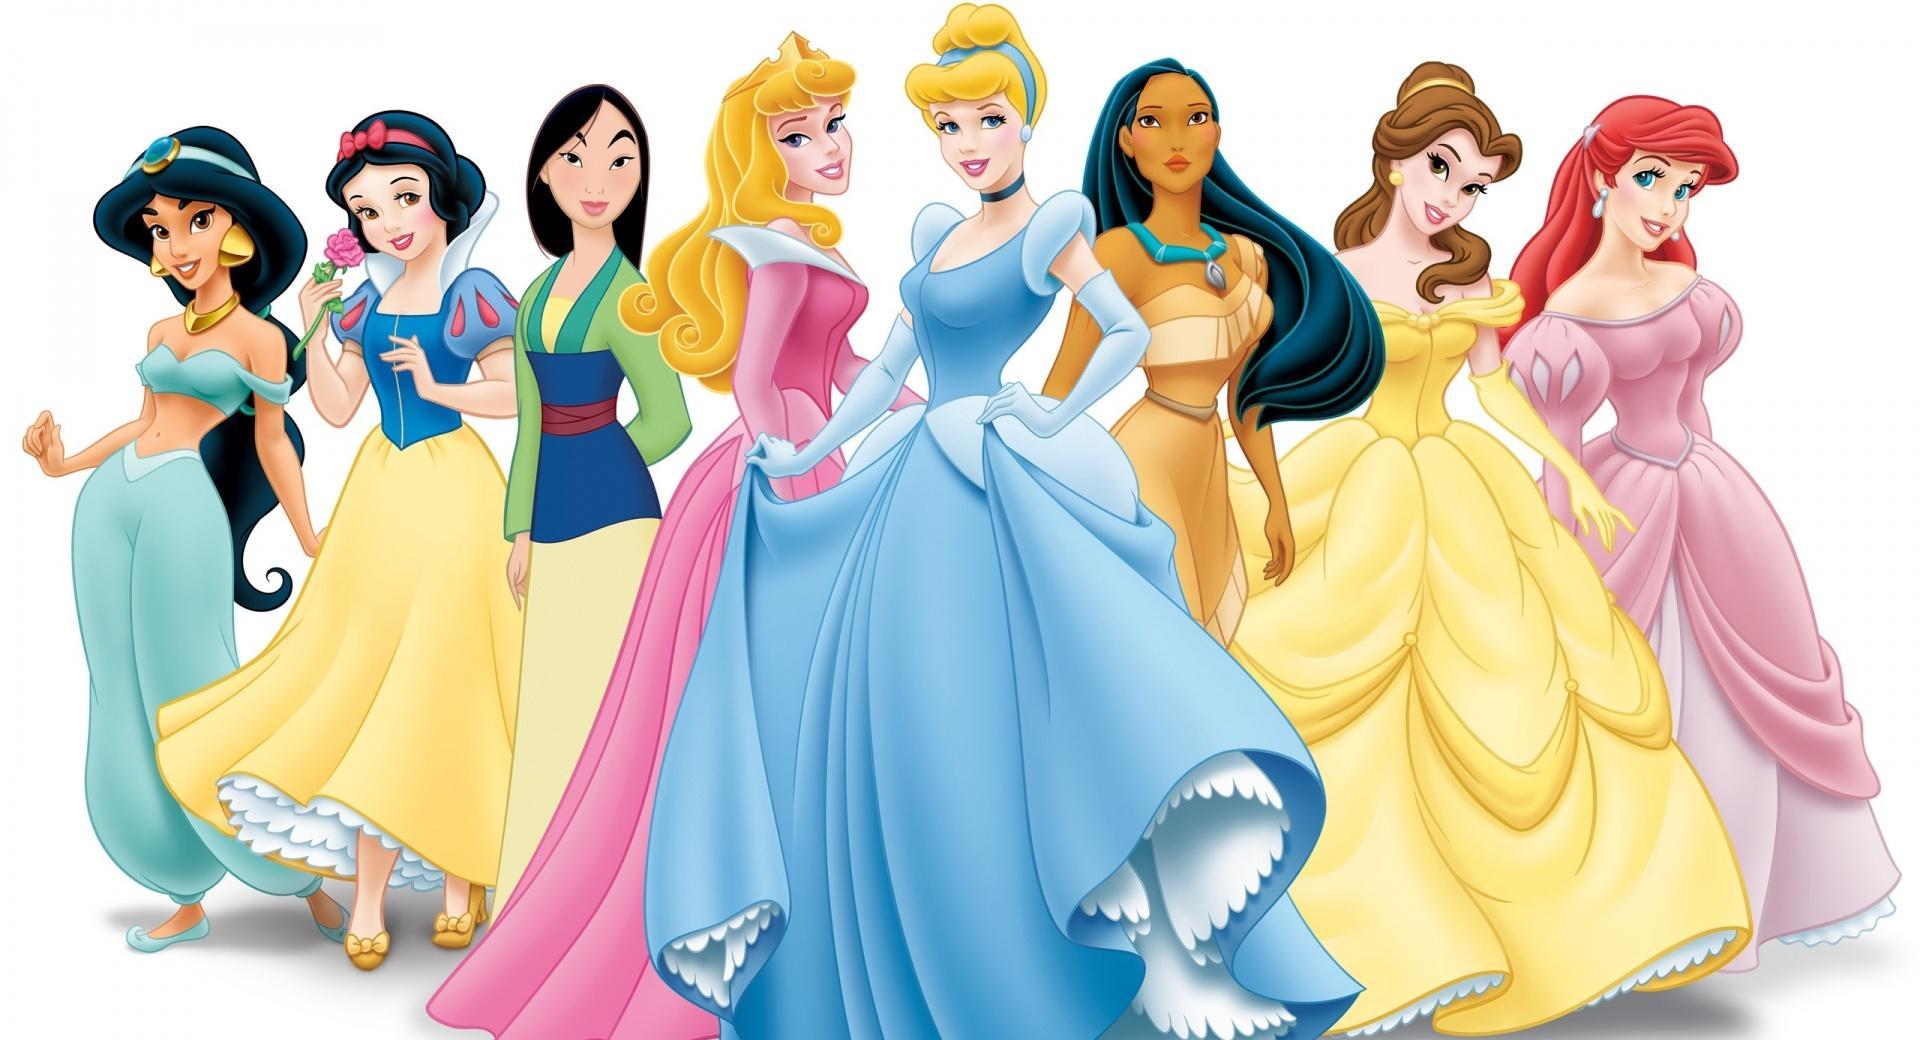 Disney Princess wallpapers HD quality